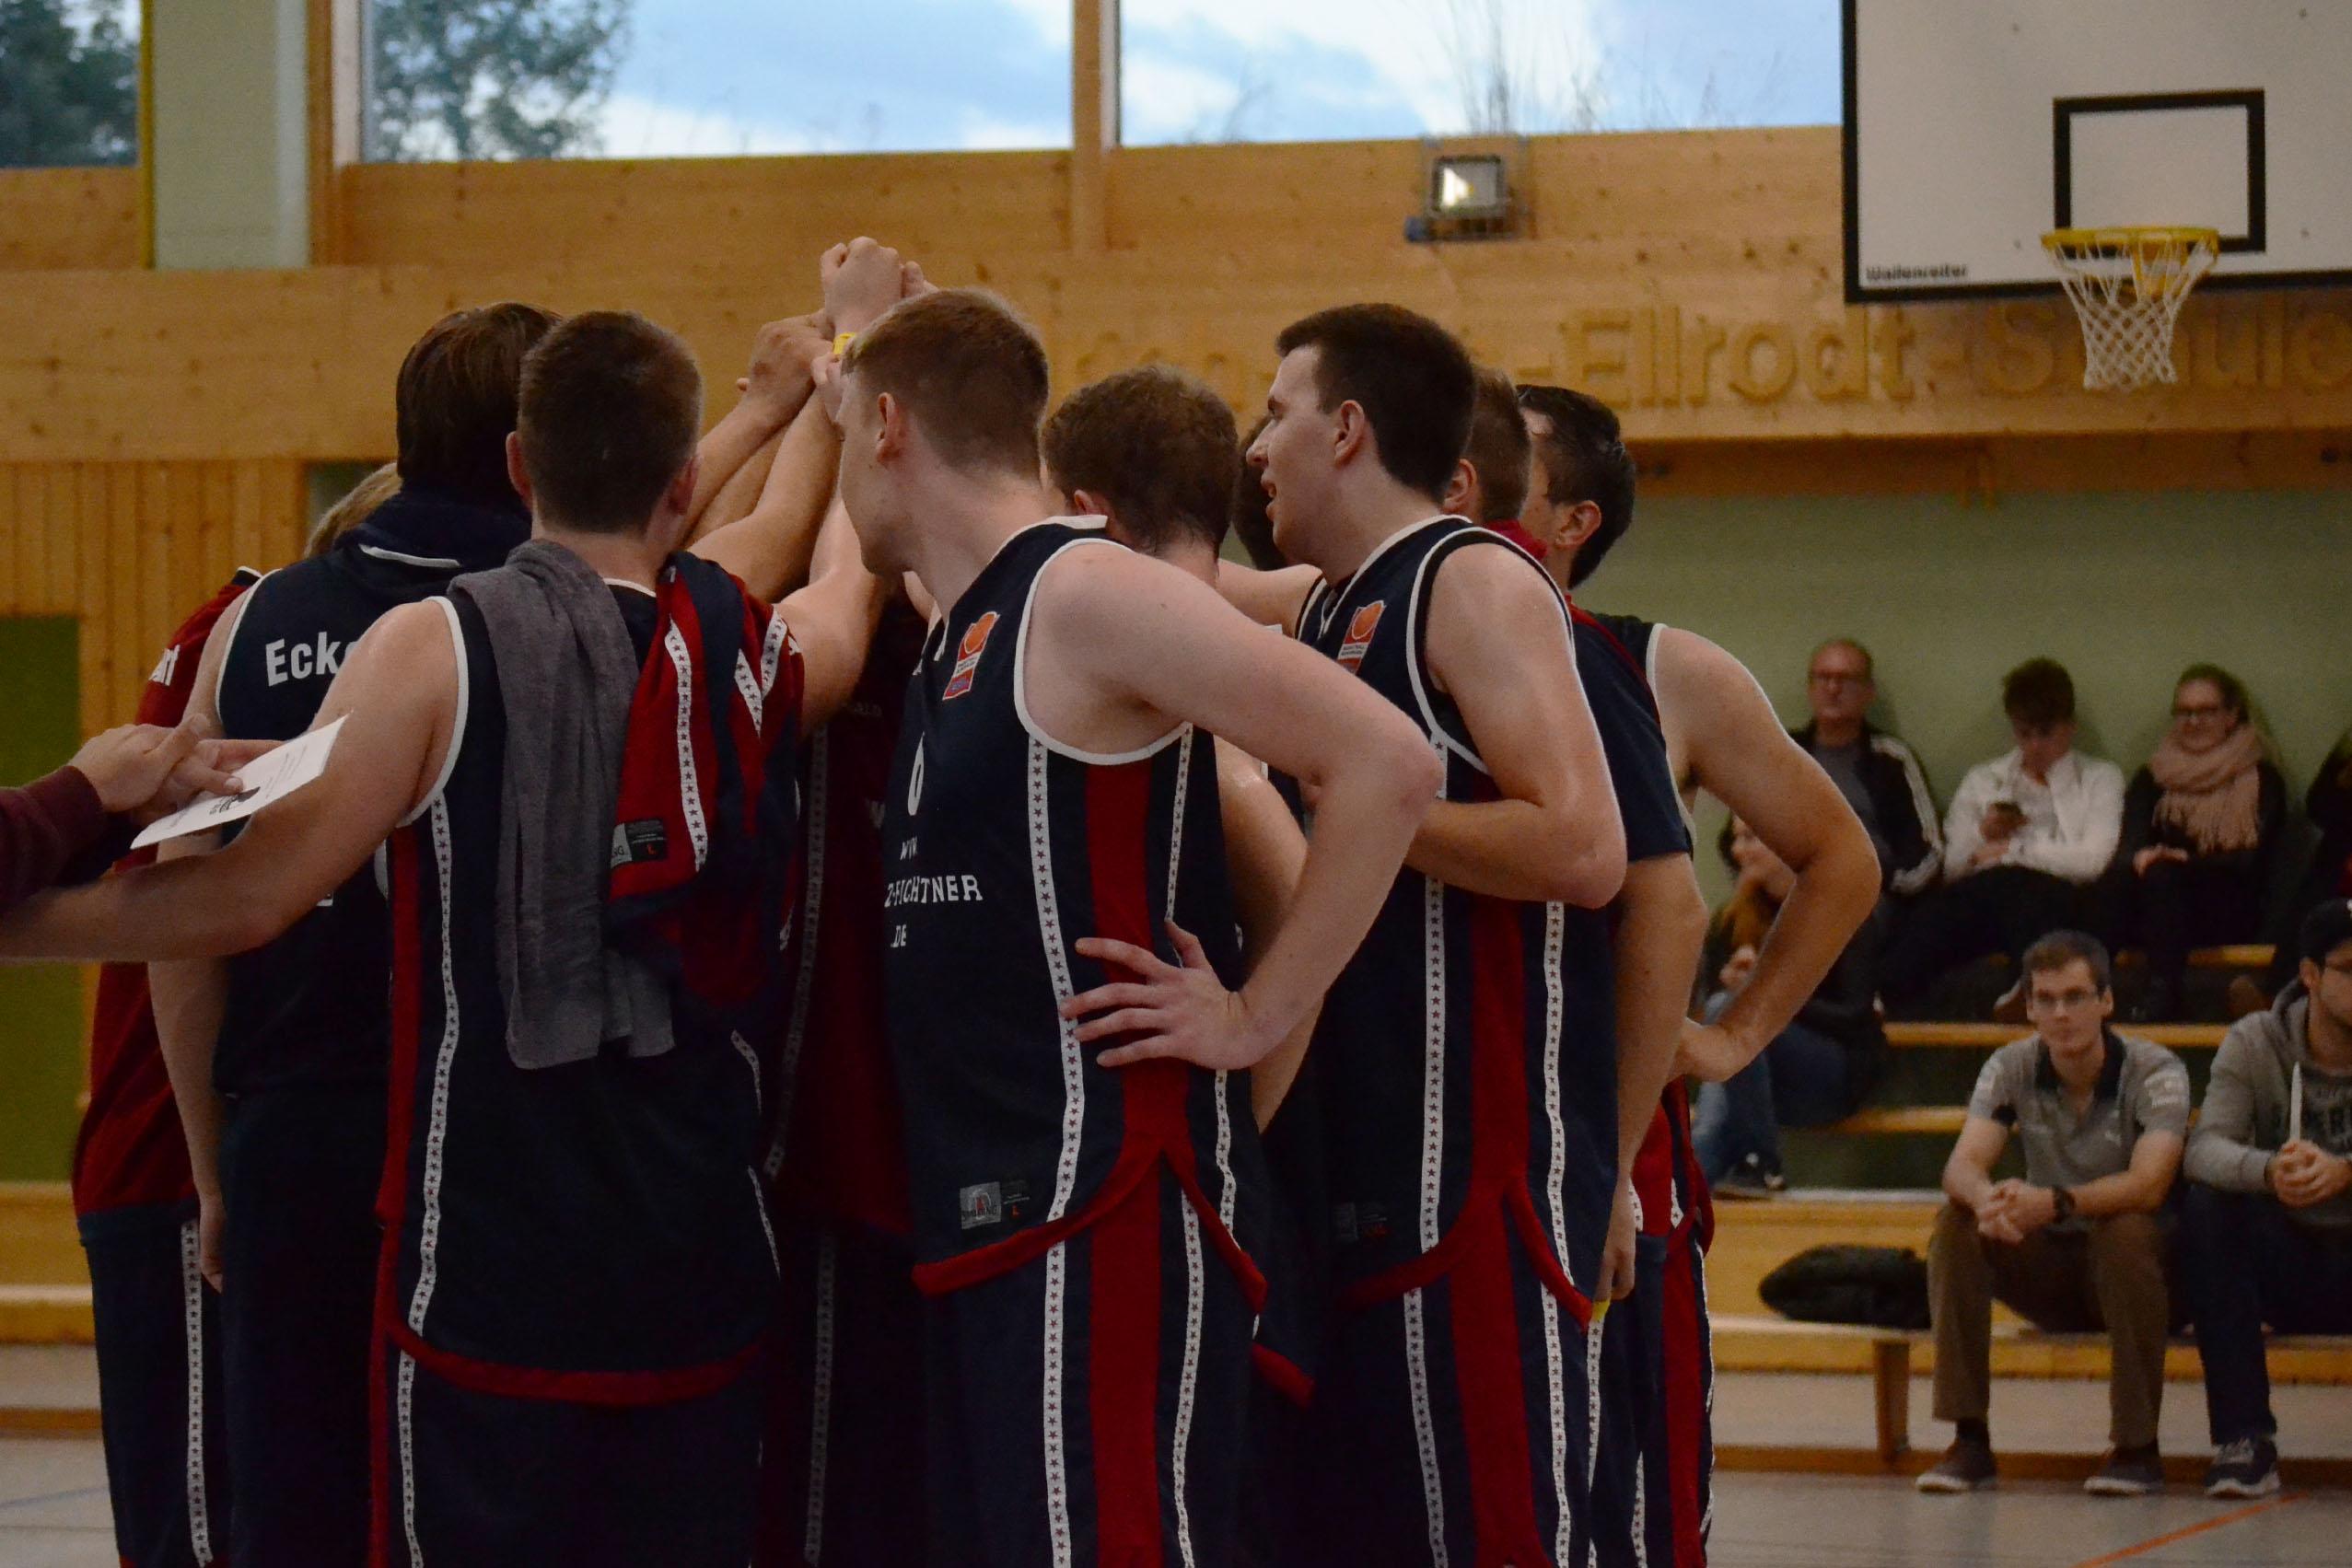 team-eckersdorf